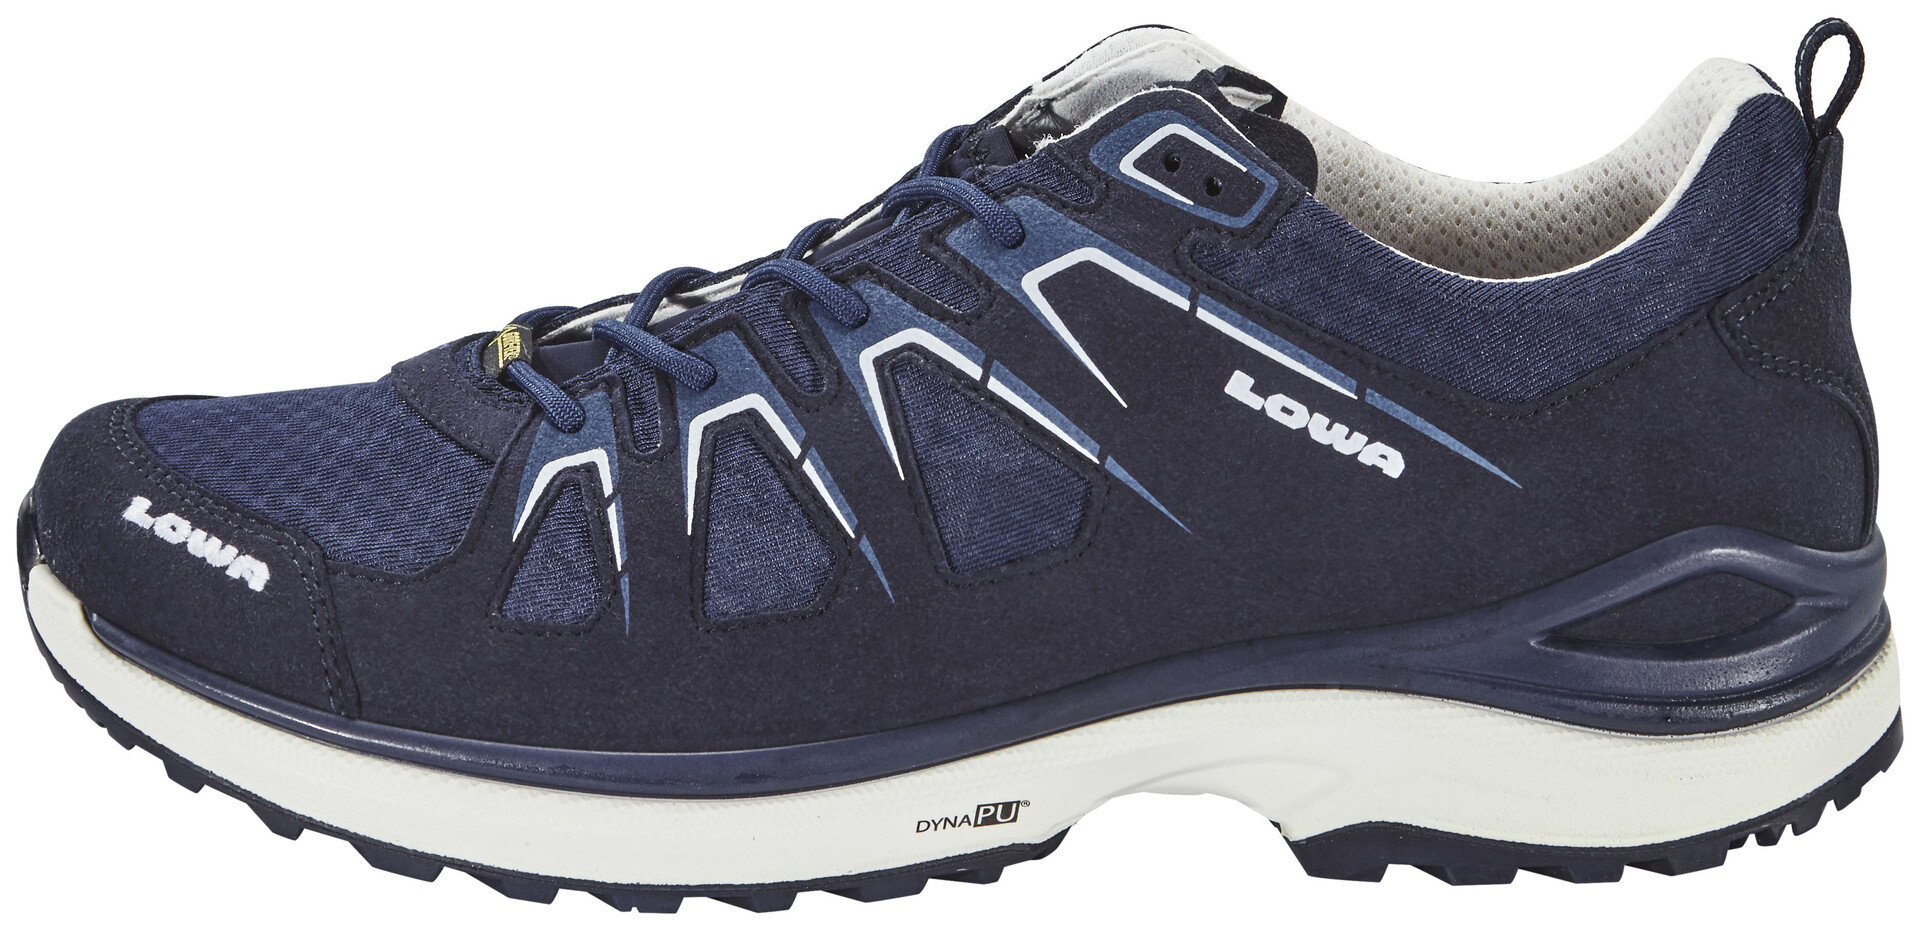 Campz Chaussures Innox Homme Sur Lowa Evo Gtx Bleu w0FvxRSq